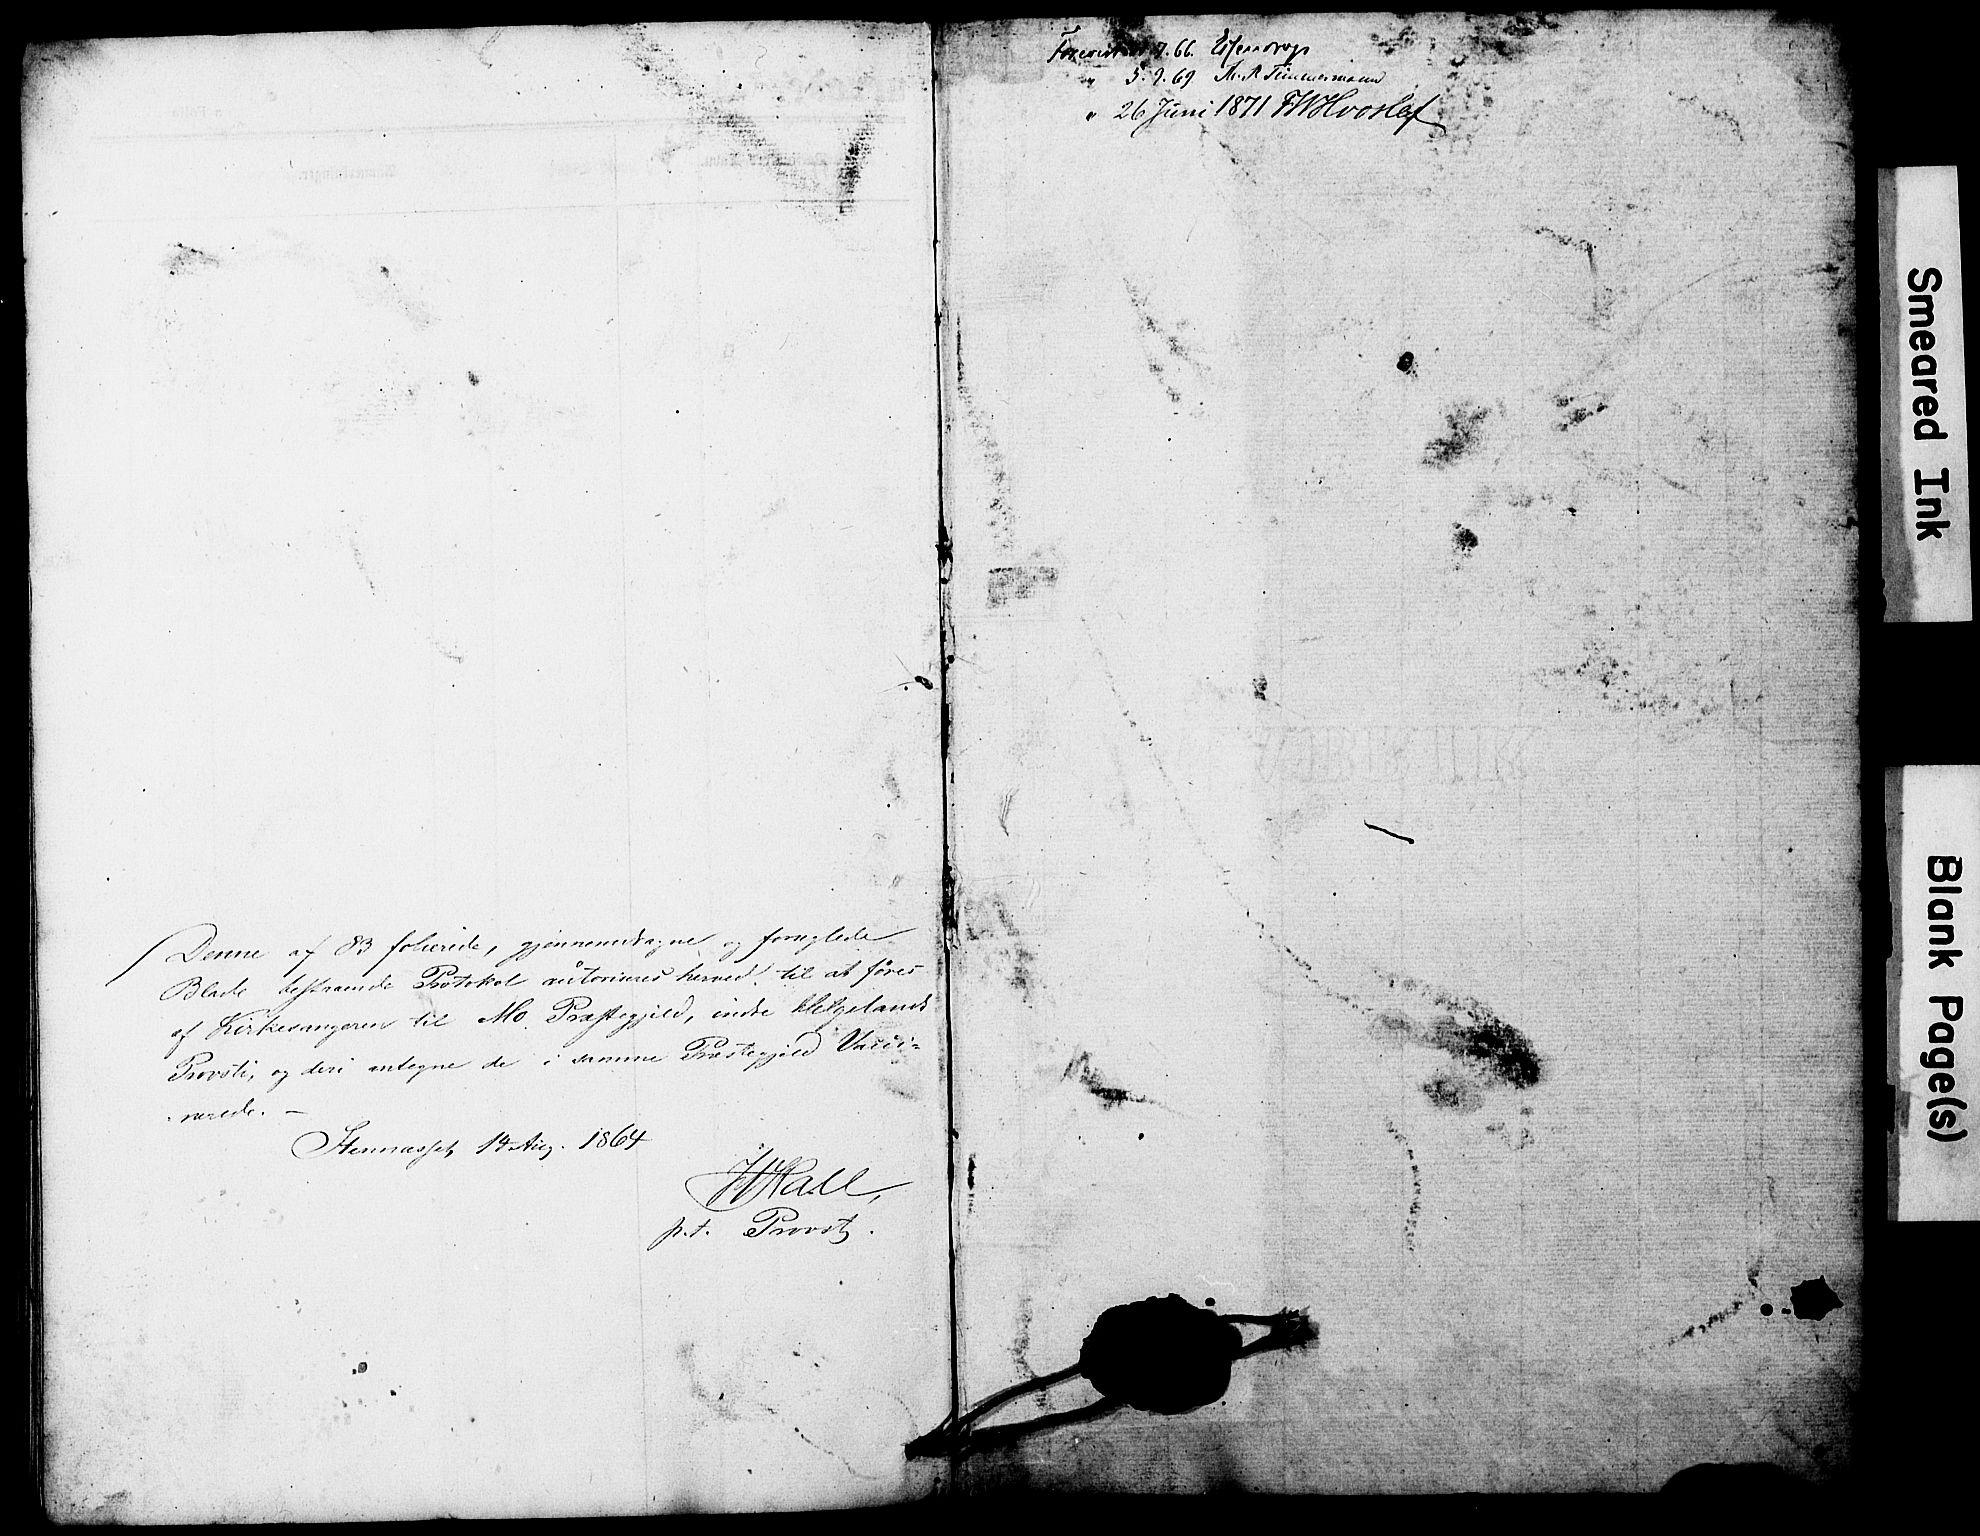 SAT, Ministerialprotokoller, klokkerbøker og fødselsregistre - Nordland, 827/L0428: Klokkerbok nr. 827C17, 1861-1870